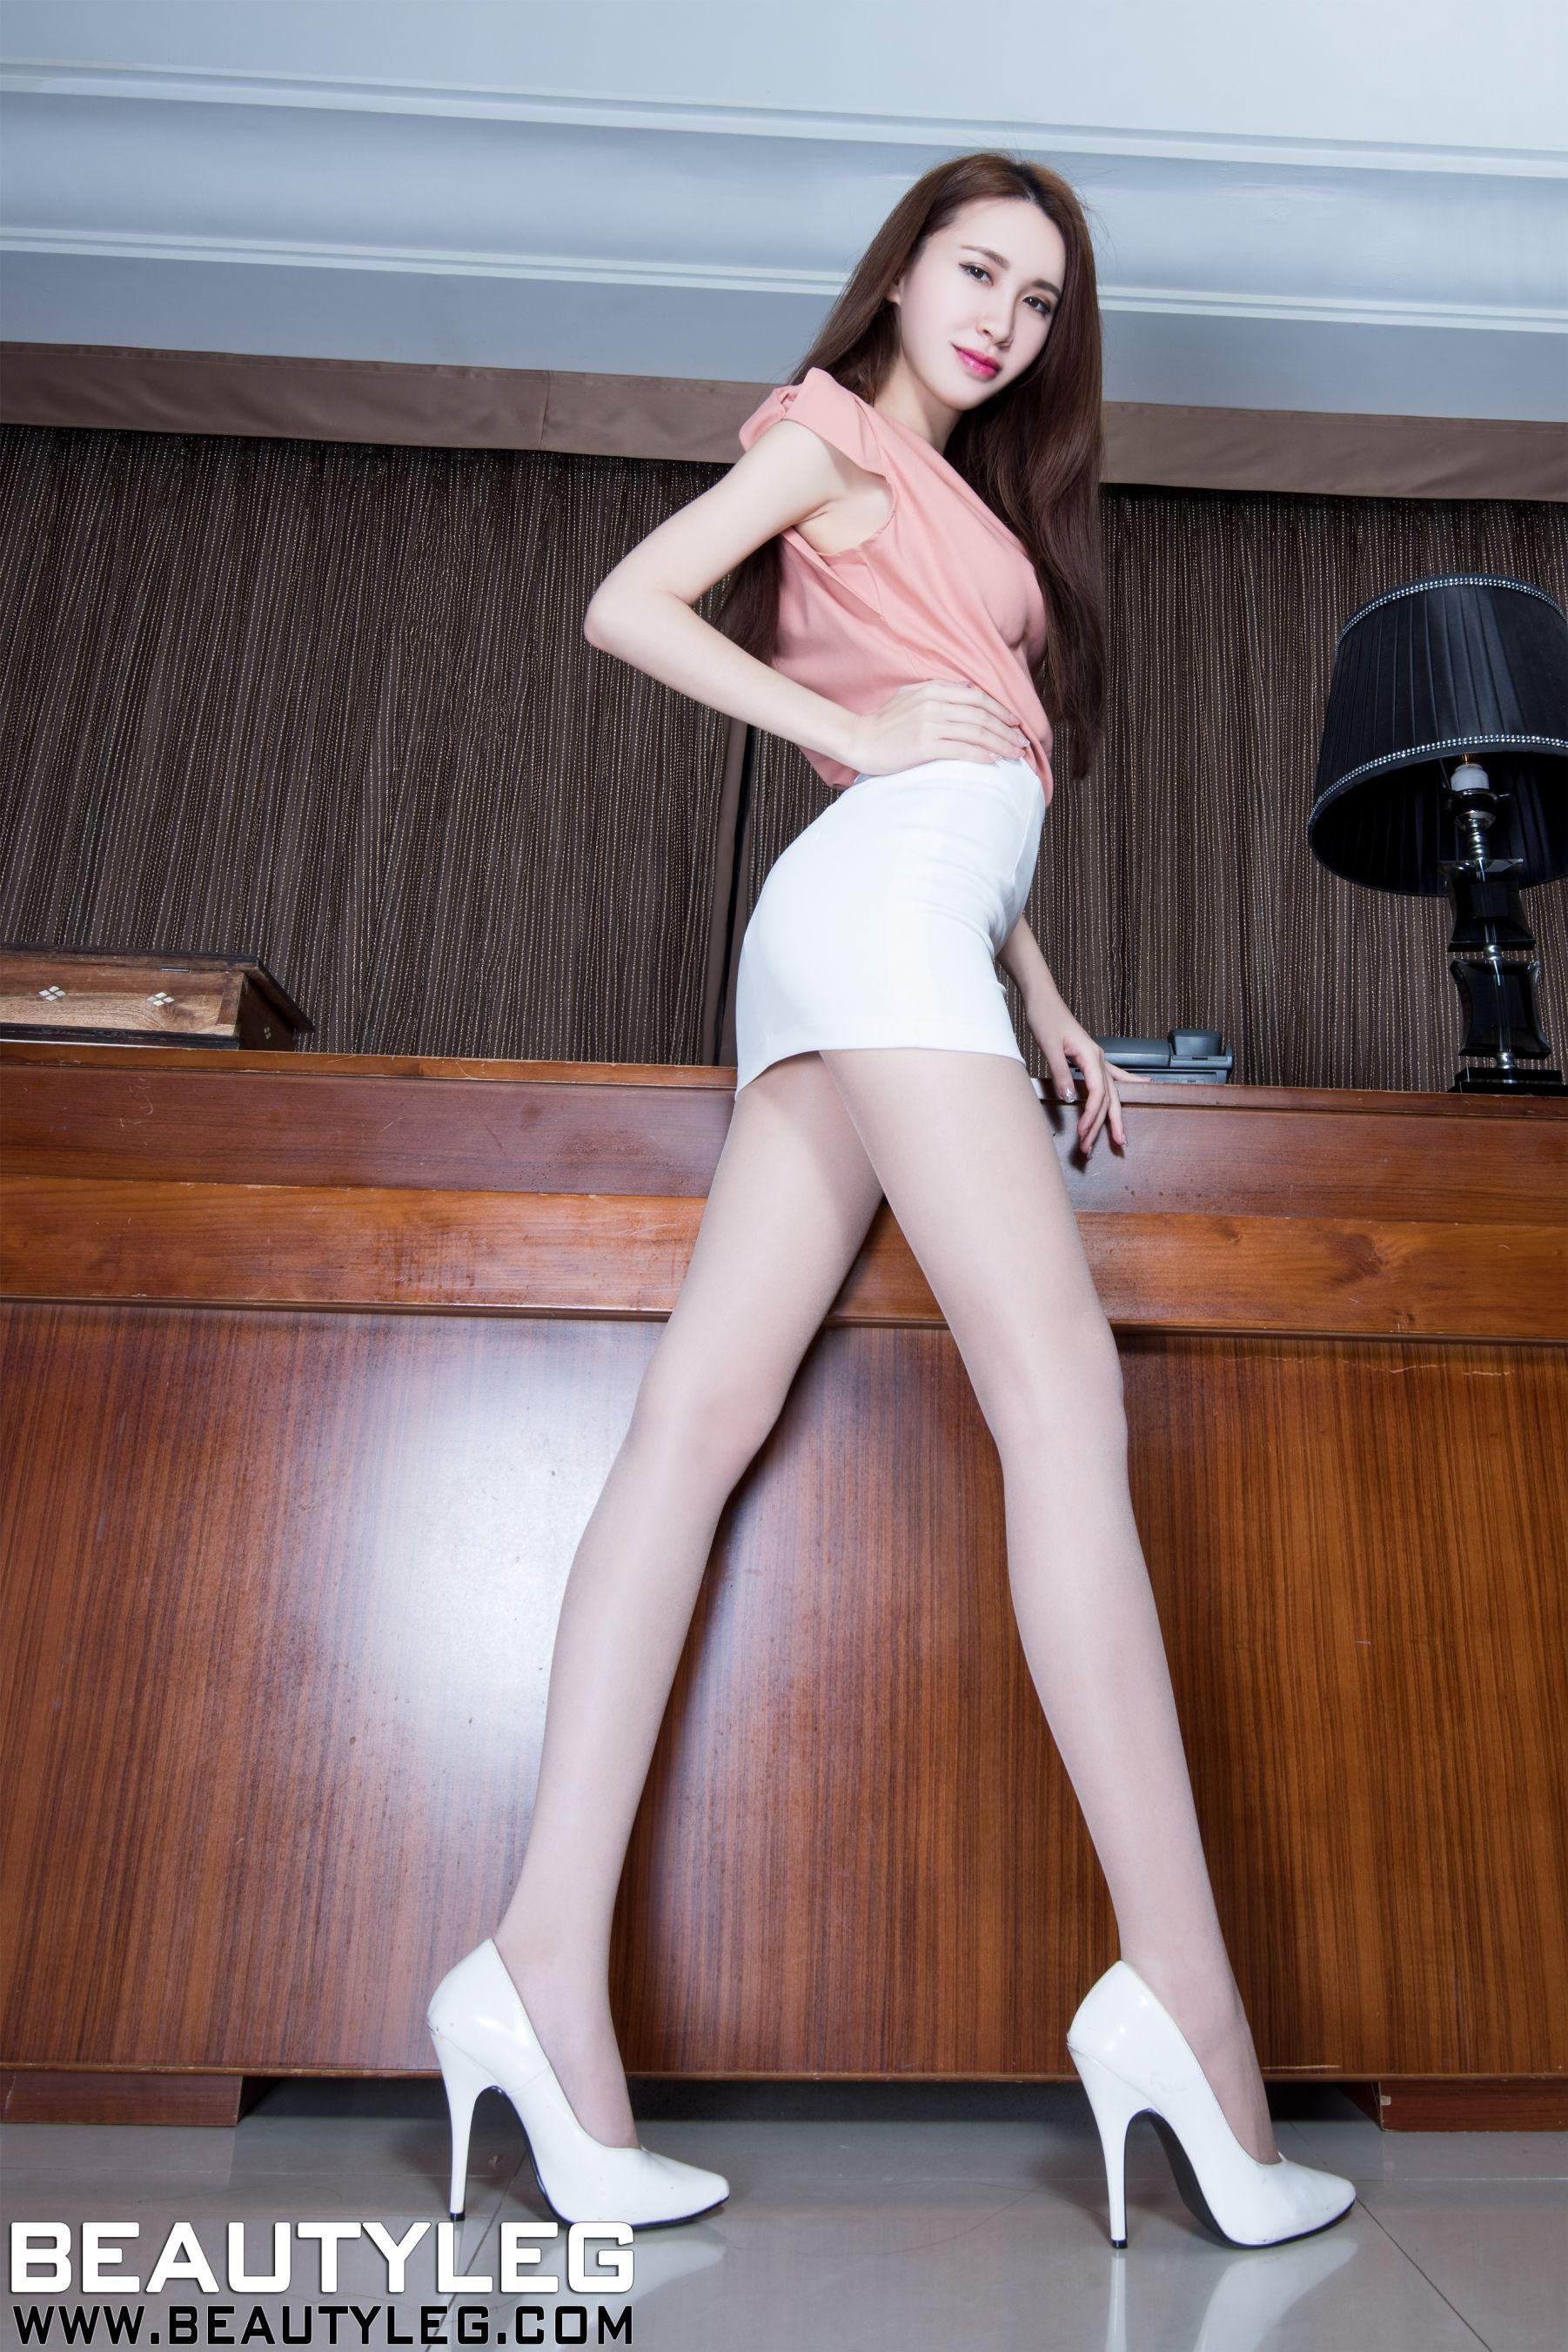 VOL.882 [Beautyleg]高跟美腿:崔多朵(崔德蓉,腿模Stephy)高品质写真套图(53P)